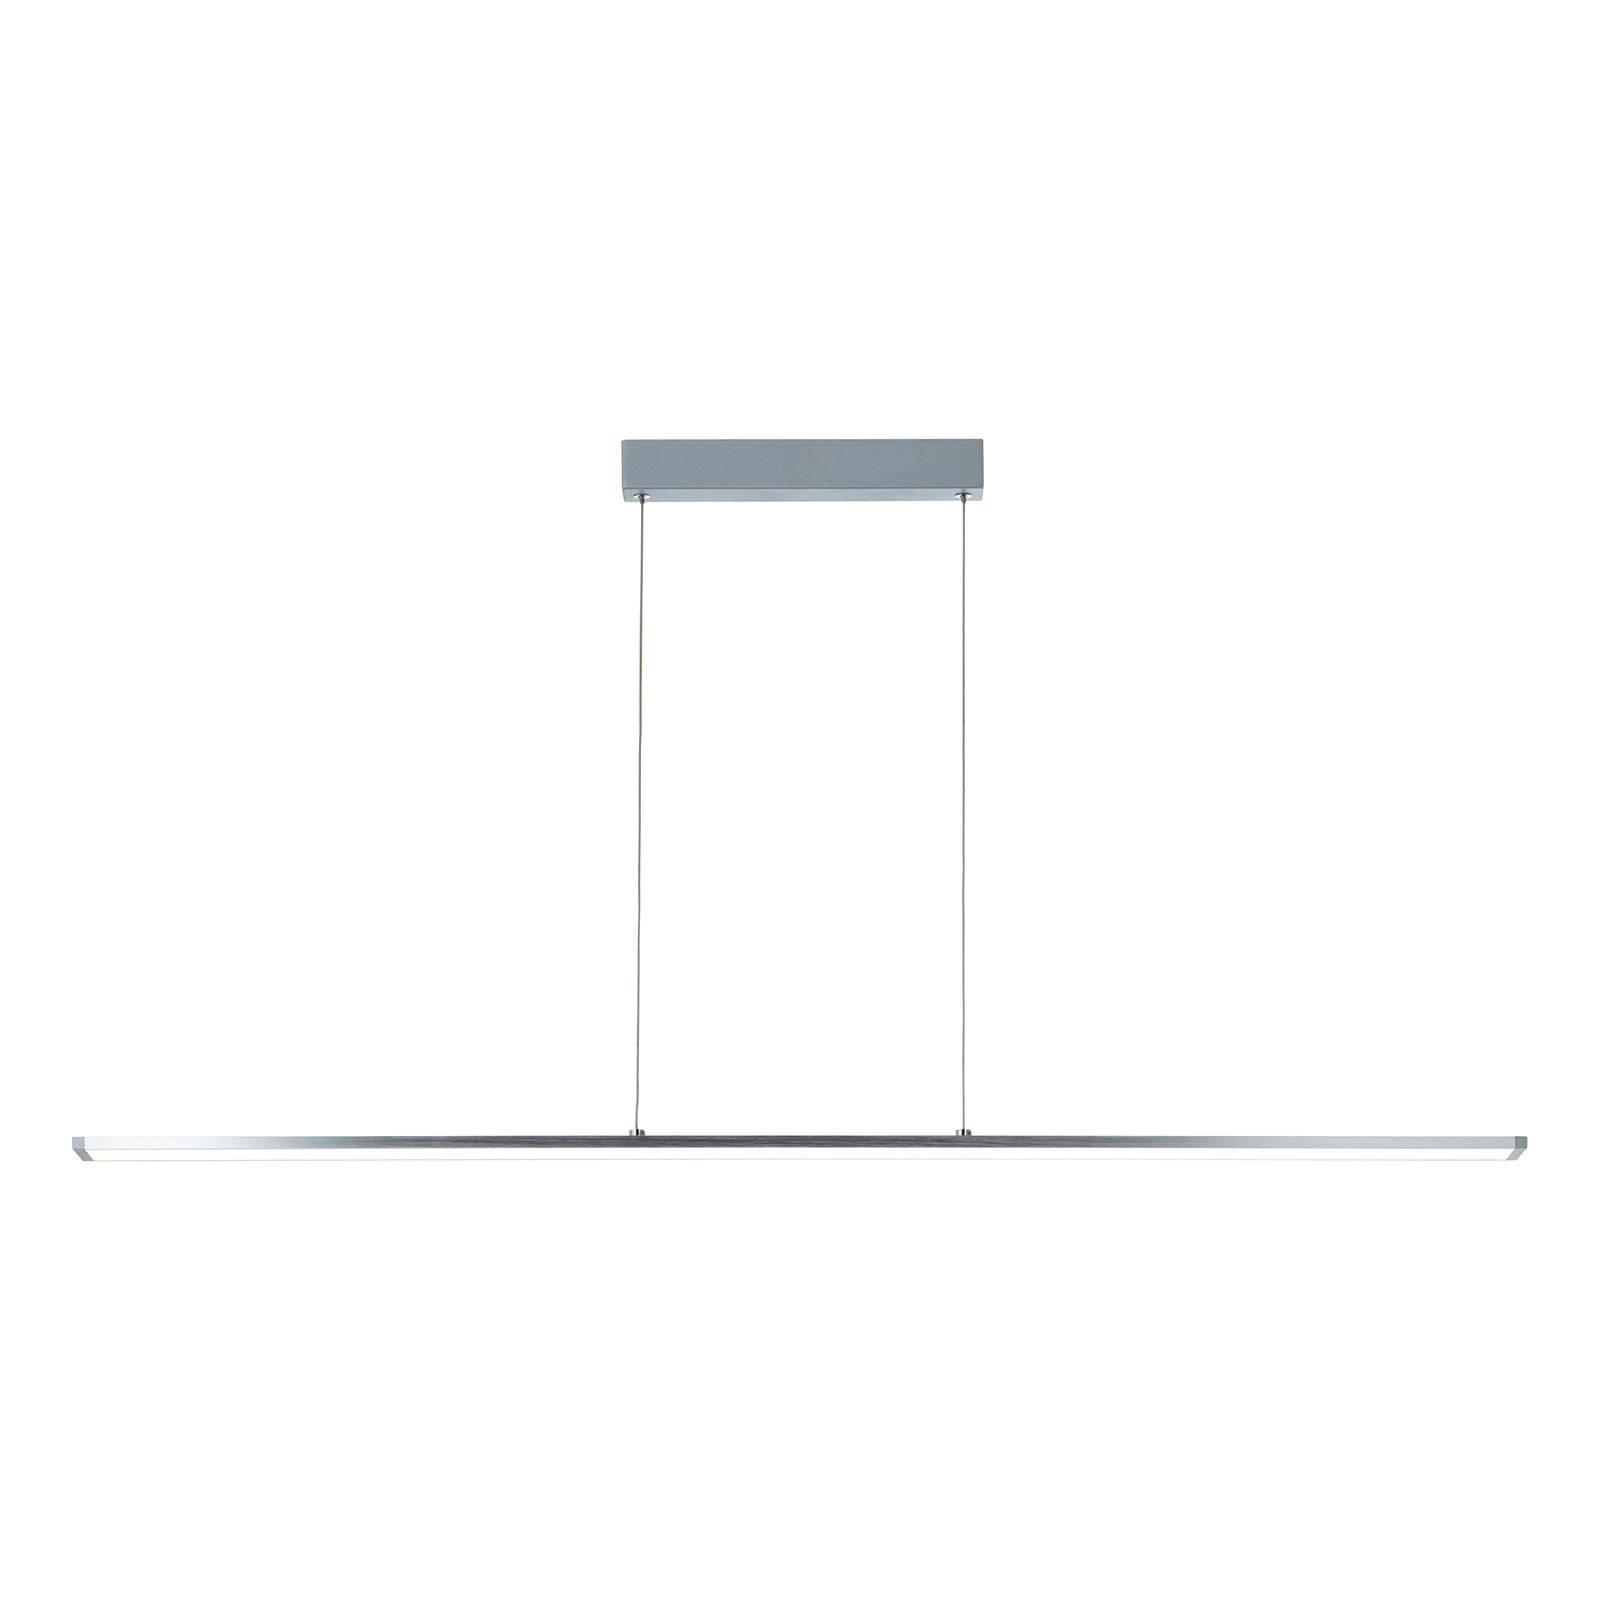 Lampa wisząca LED Entrance z funkcją easydim